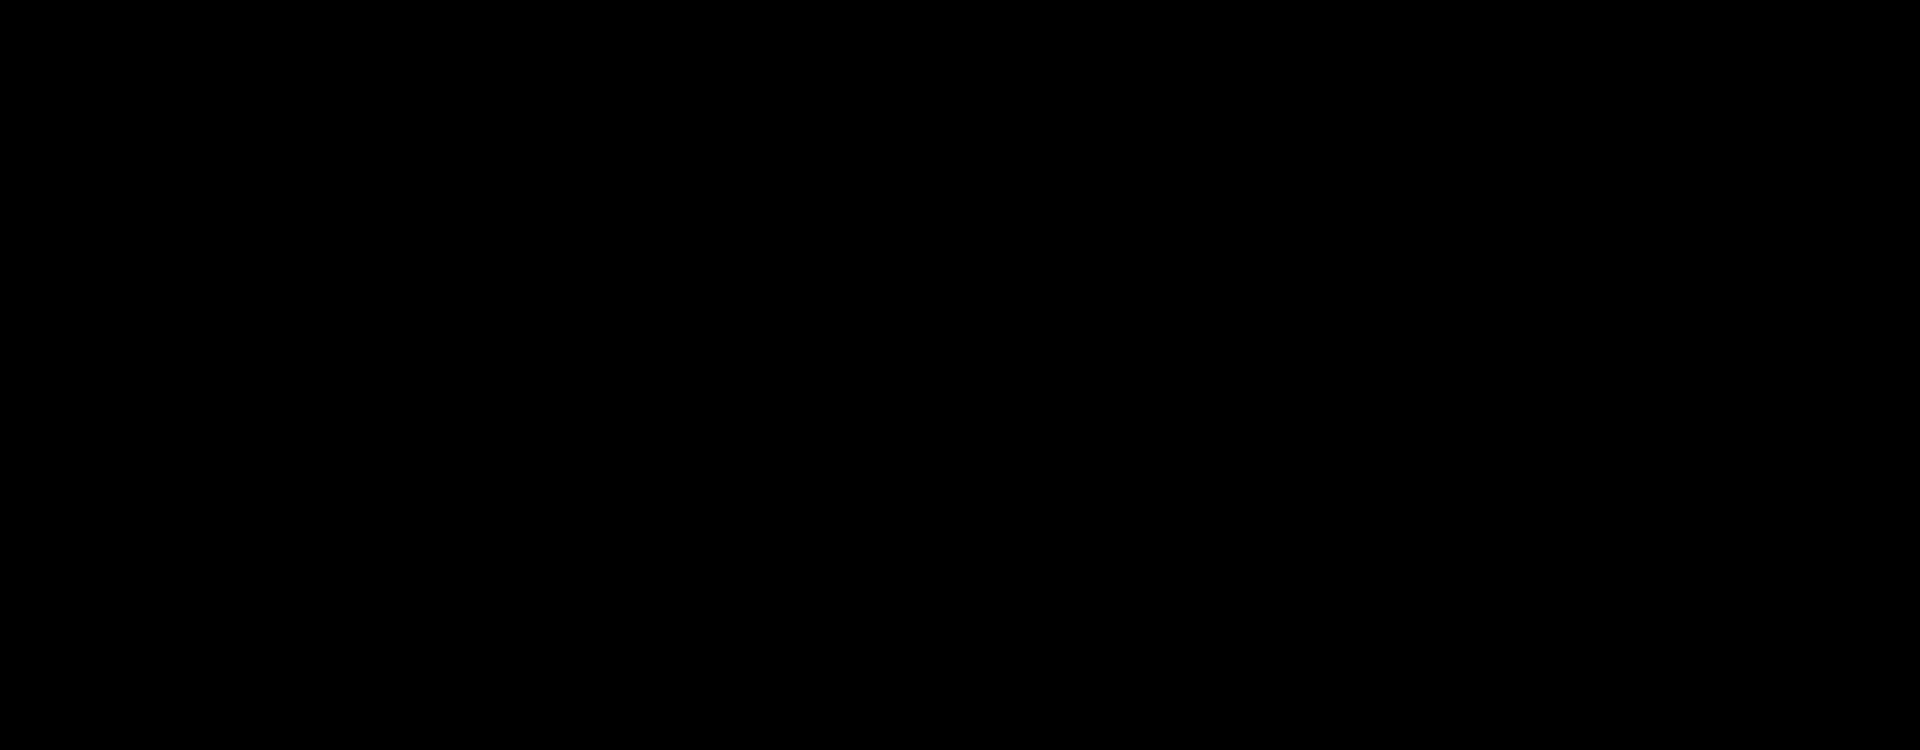 fondo-negro